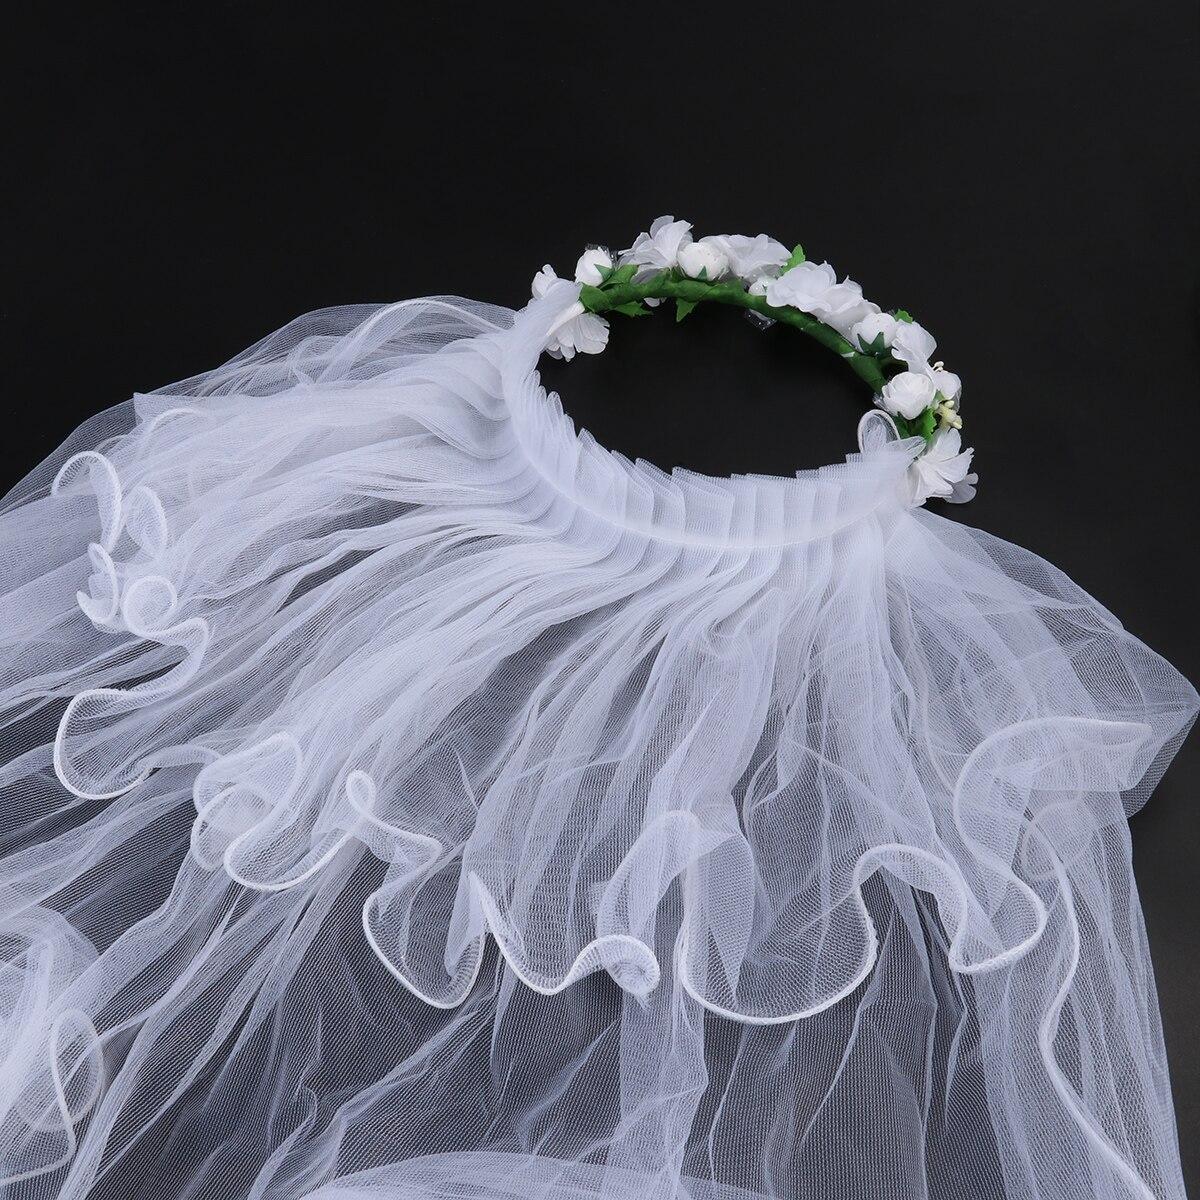 Flower Girl Veils Two Layers White Wedding Communion Hair Wreath (White)